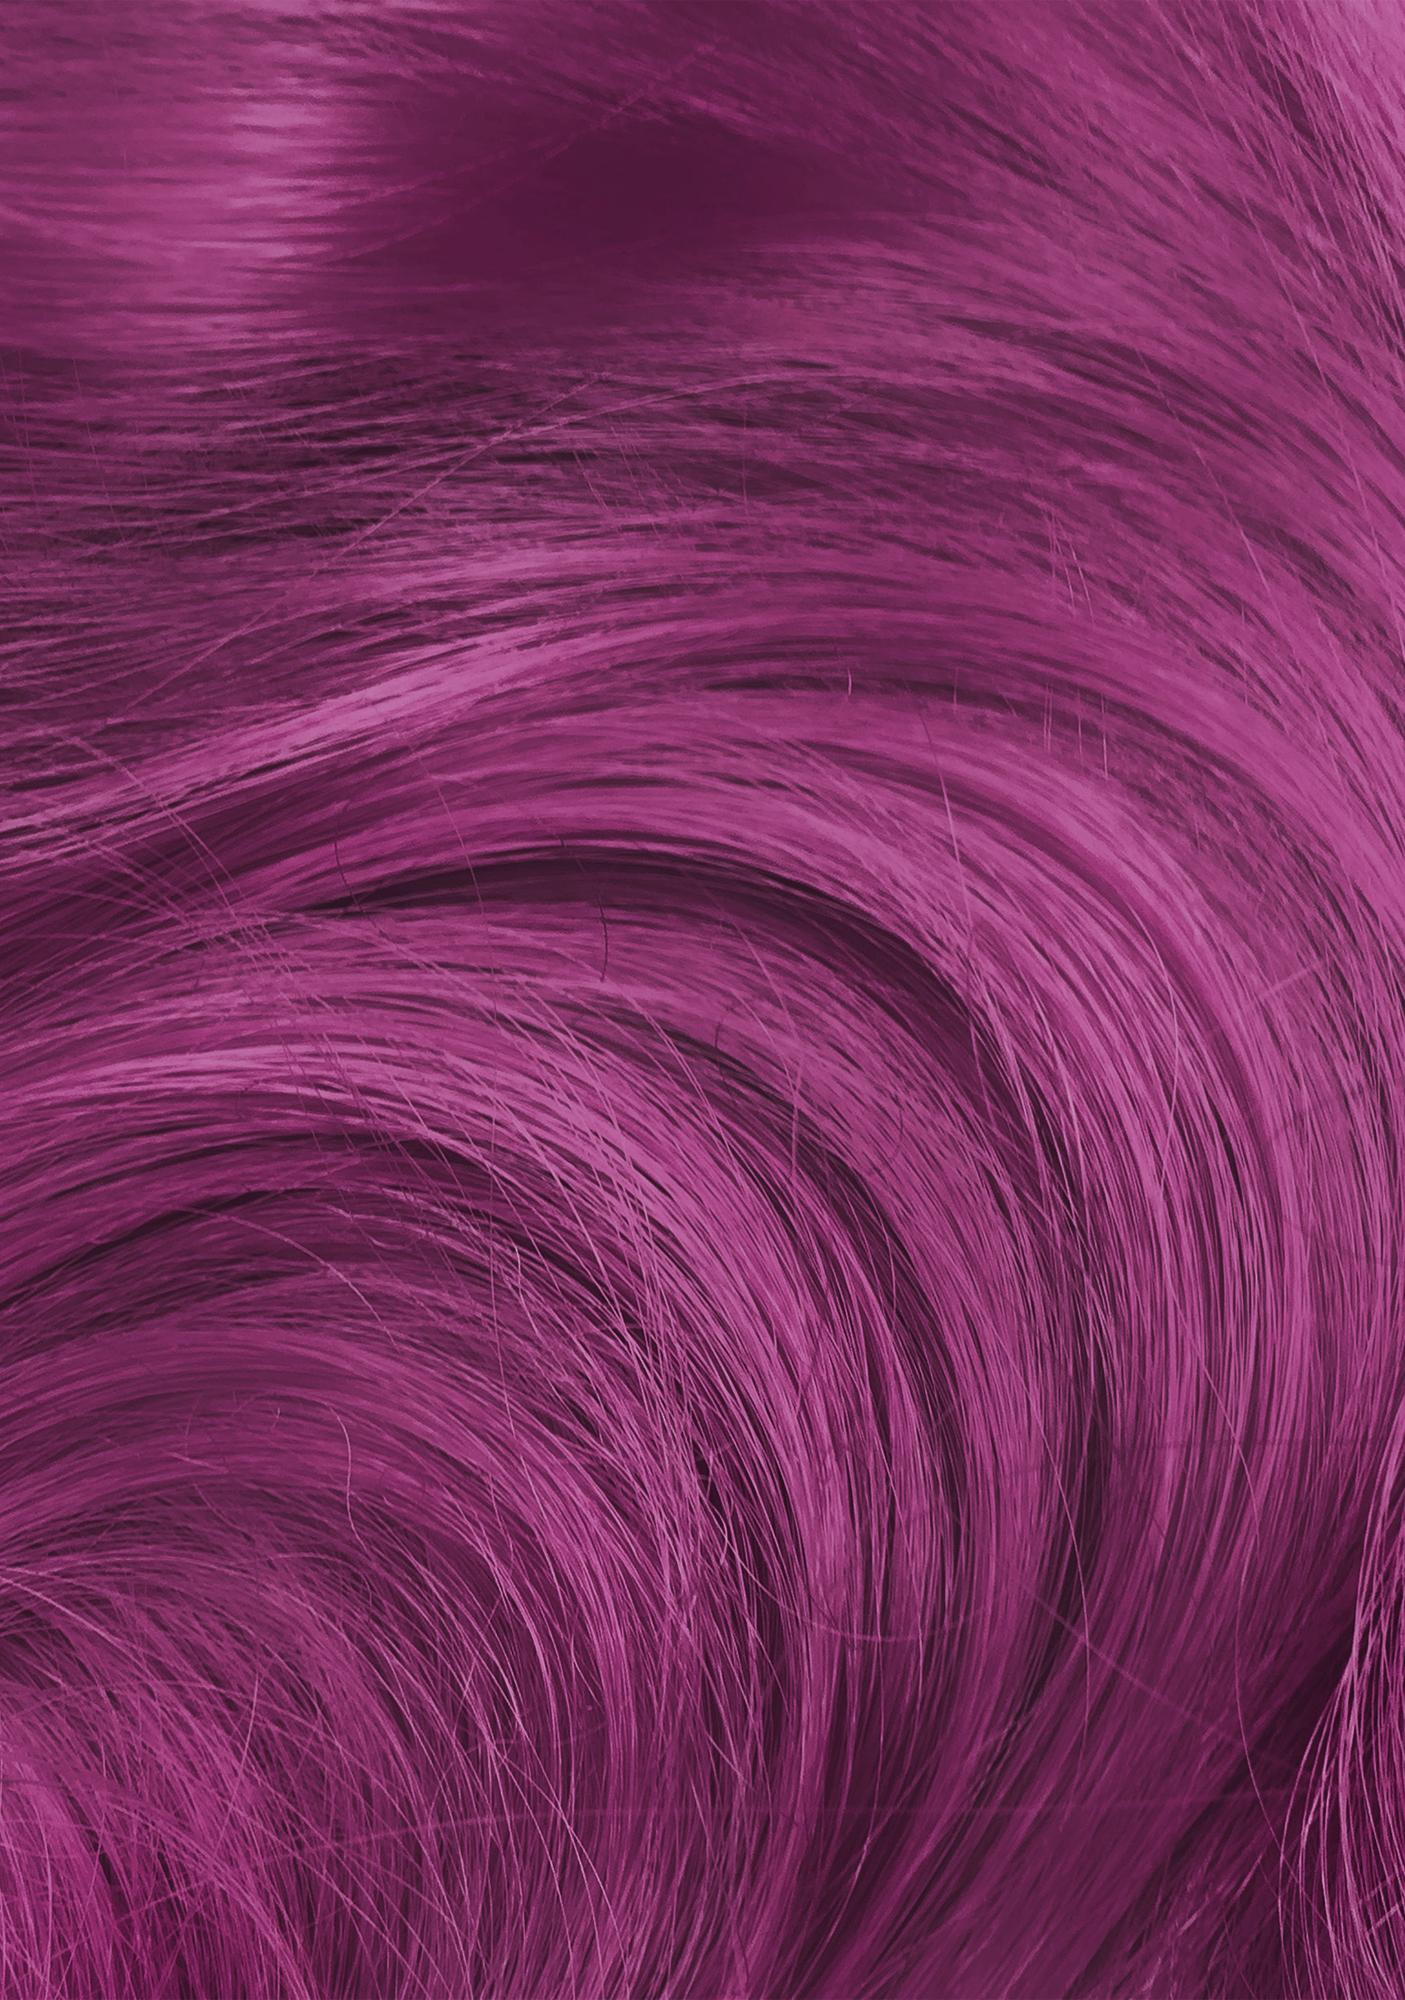 Lime Crime Aesthetic Unicorn Hair Dye